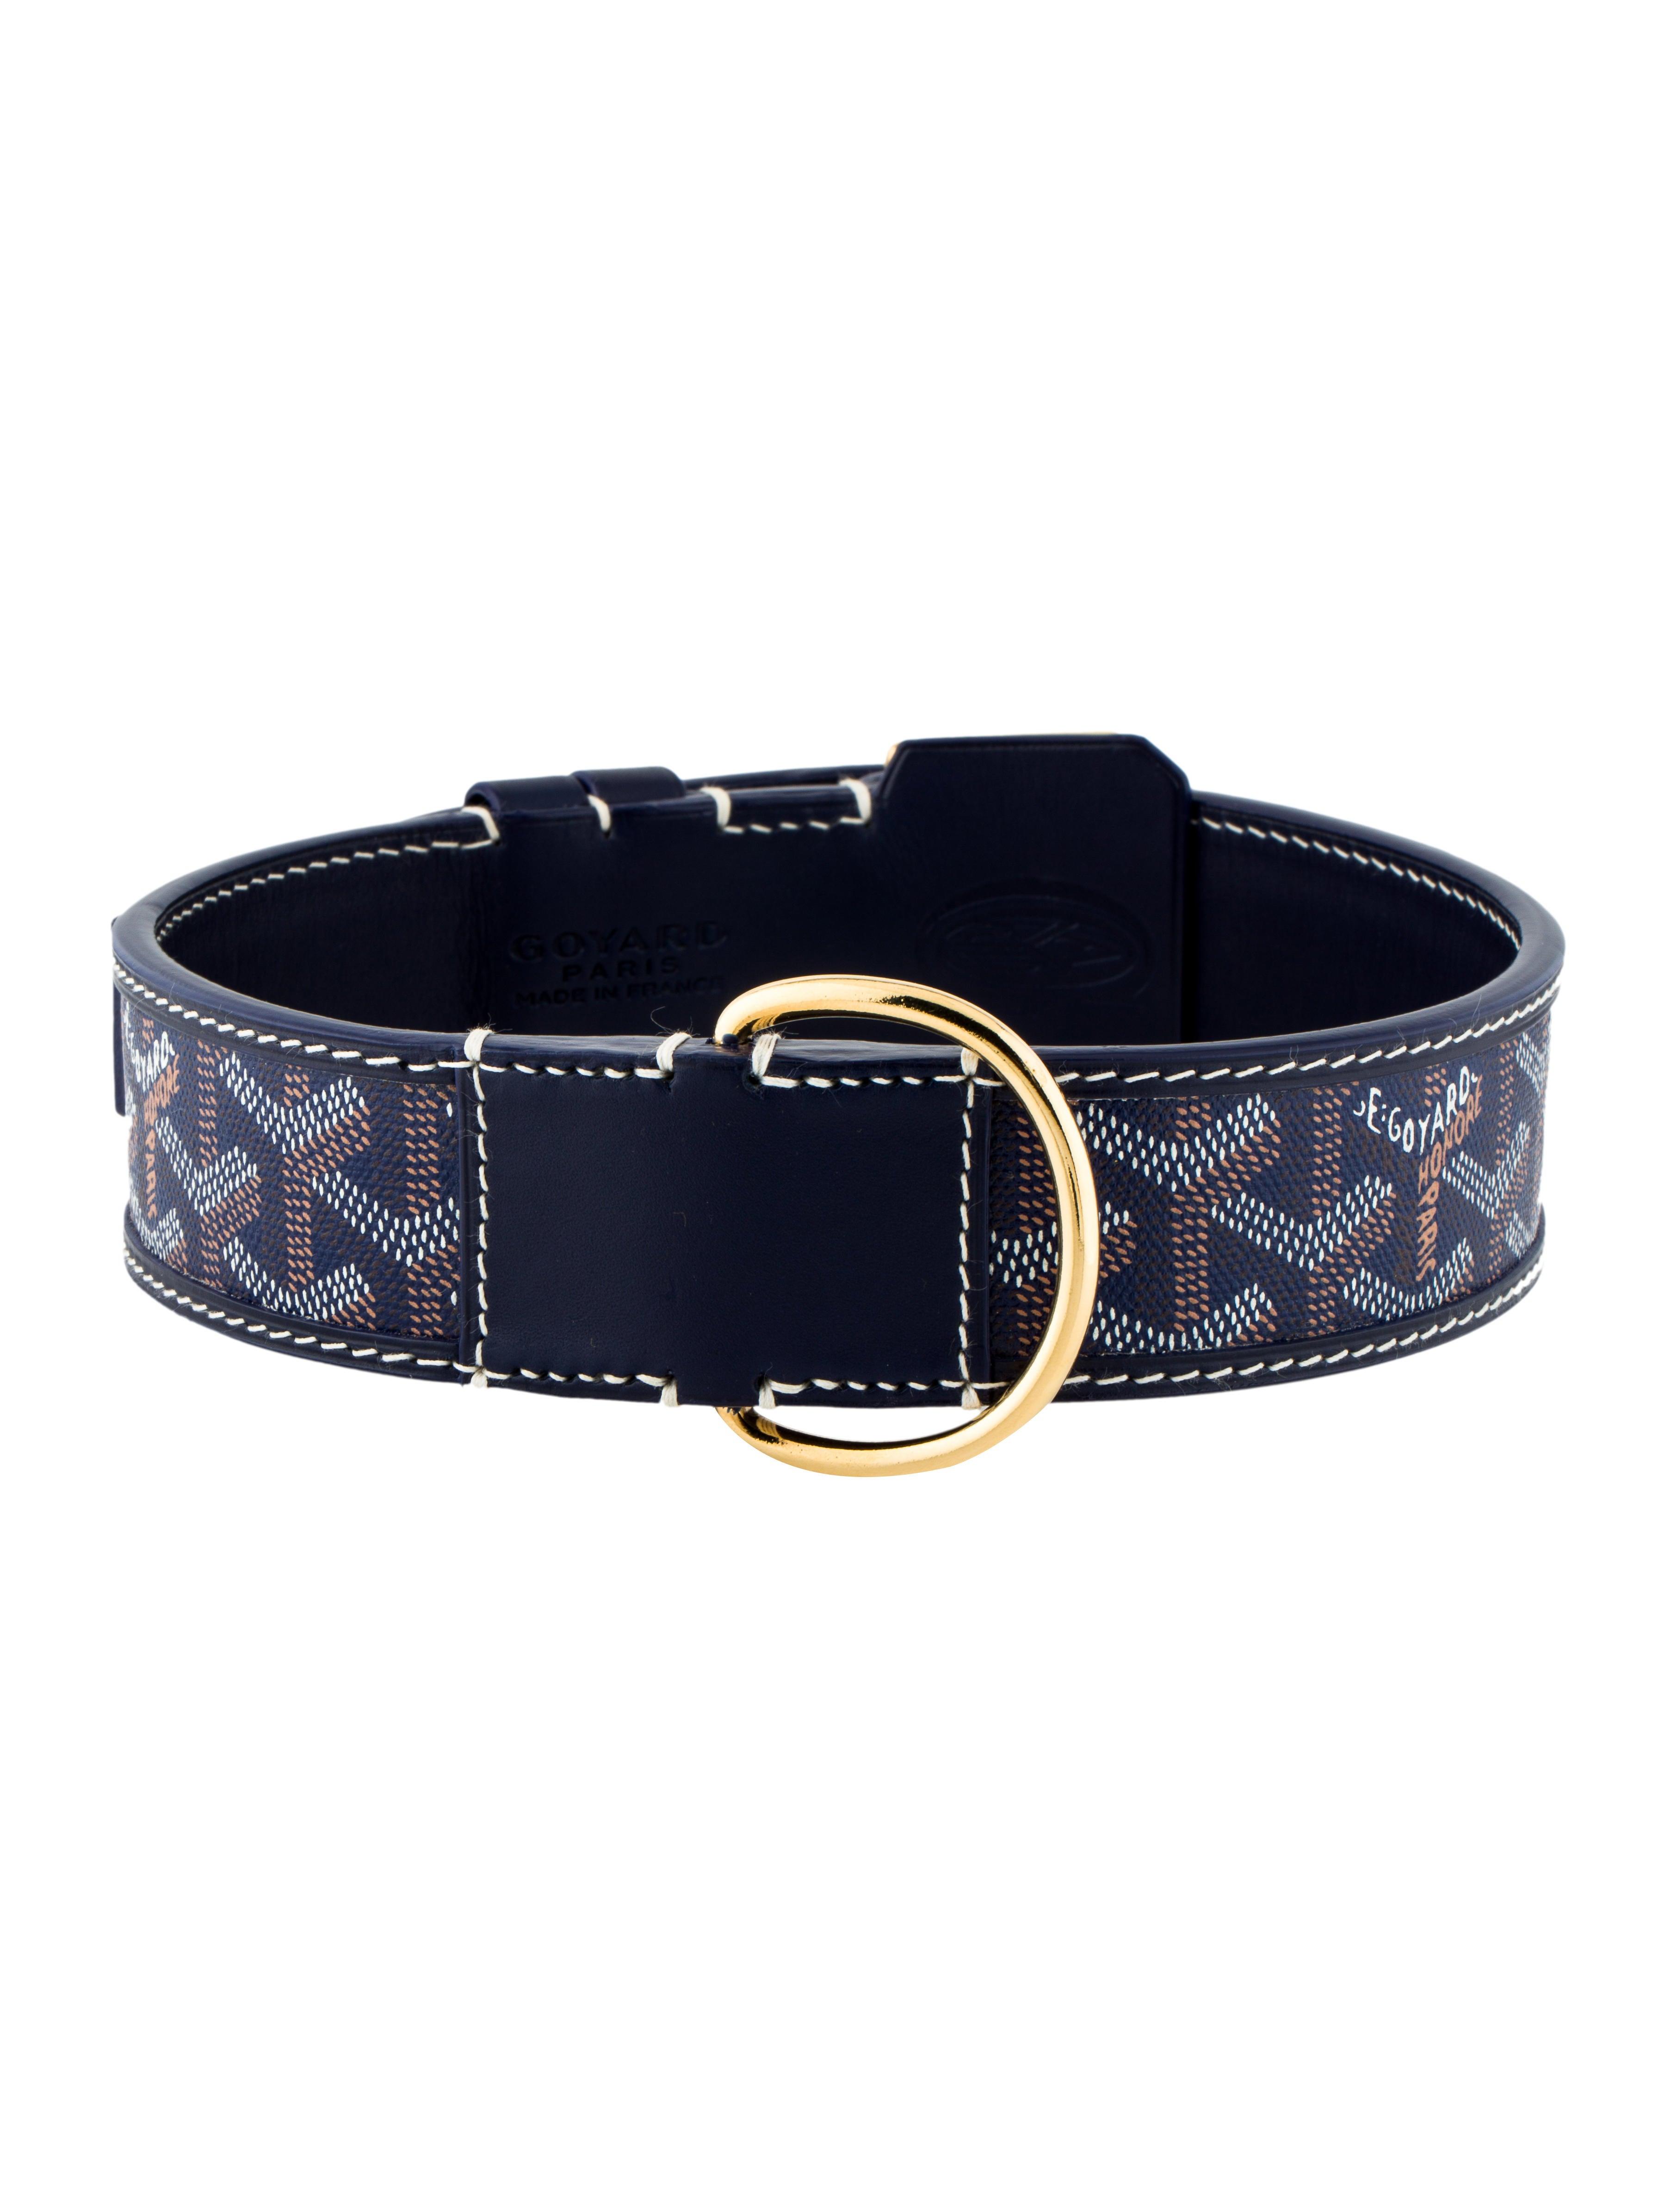 Goyard Dog Collar Price